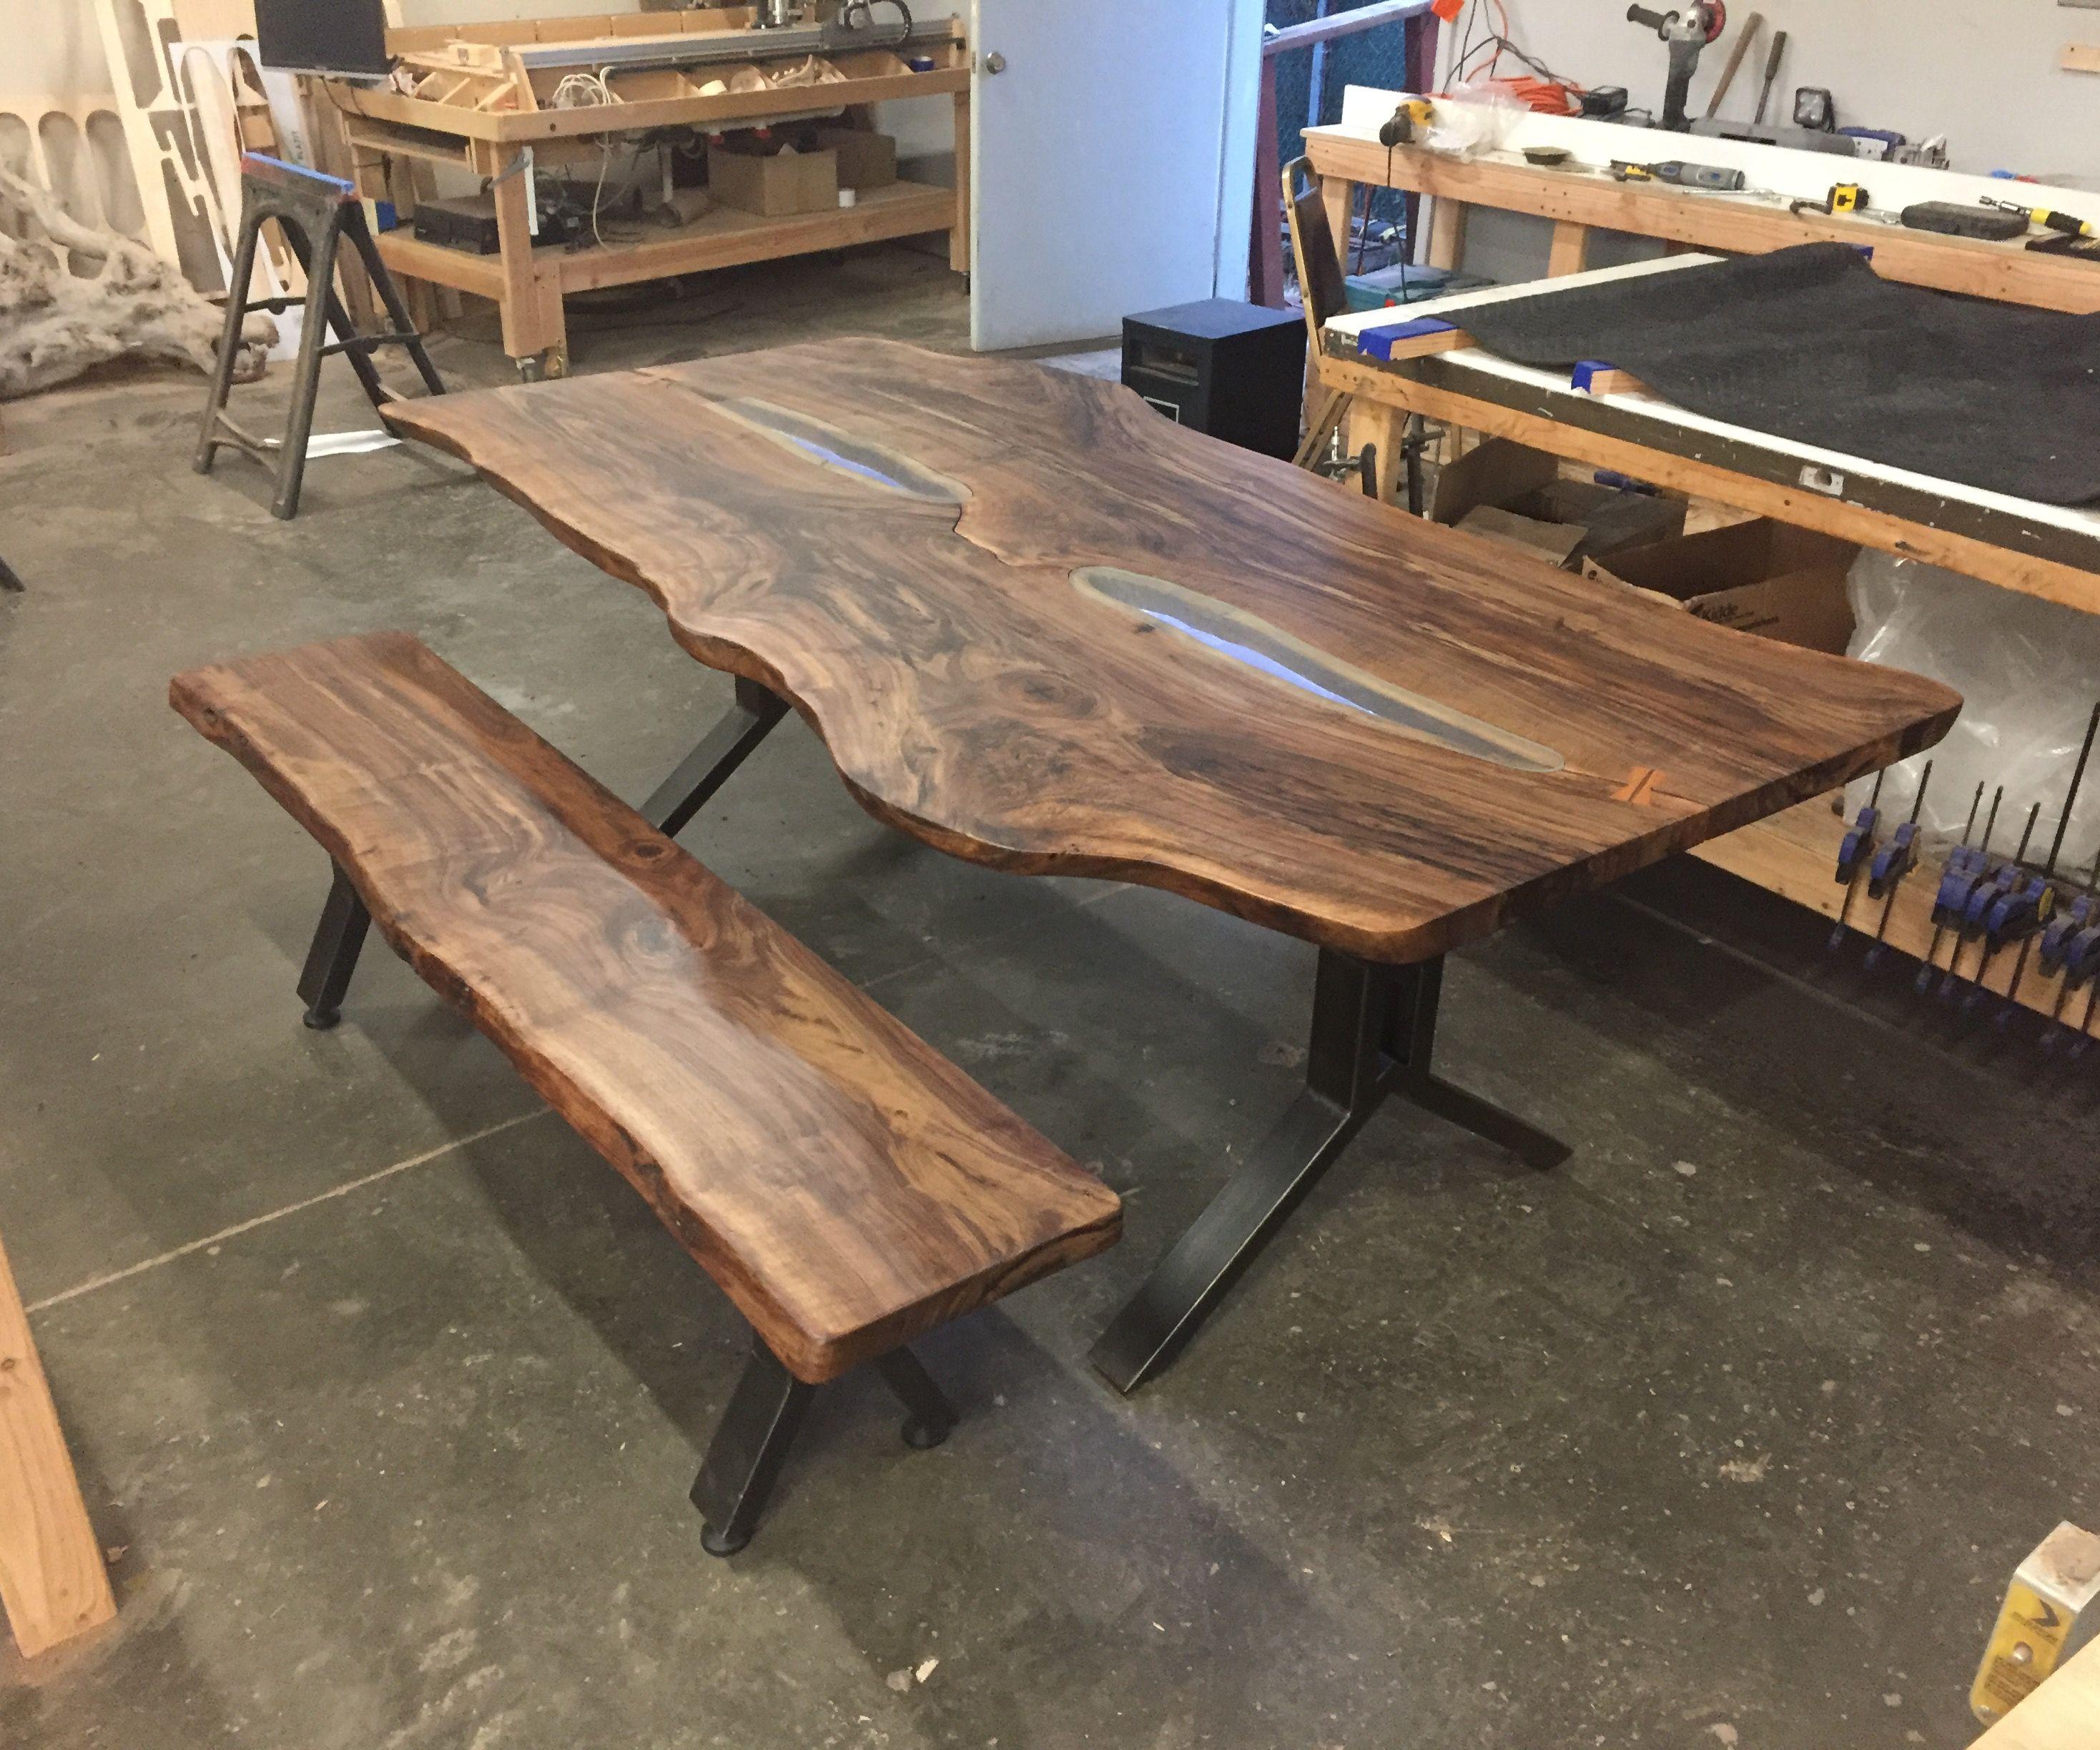 Custom Live Edge Walnut Slab Dining Set With LEDs, Glass Inlay, and Custom Steel Legs